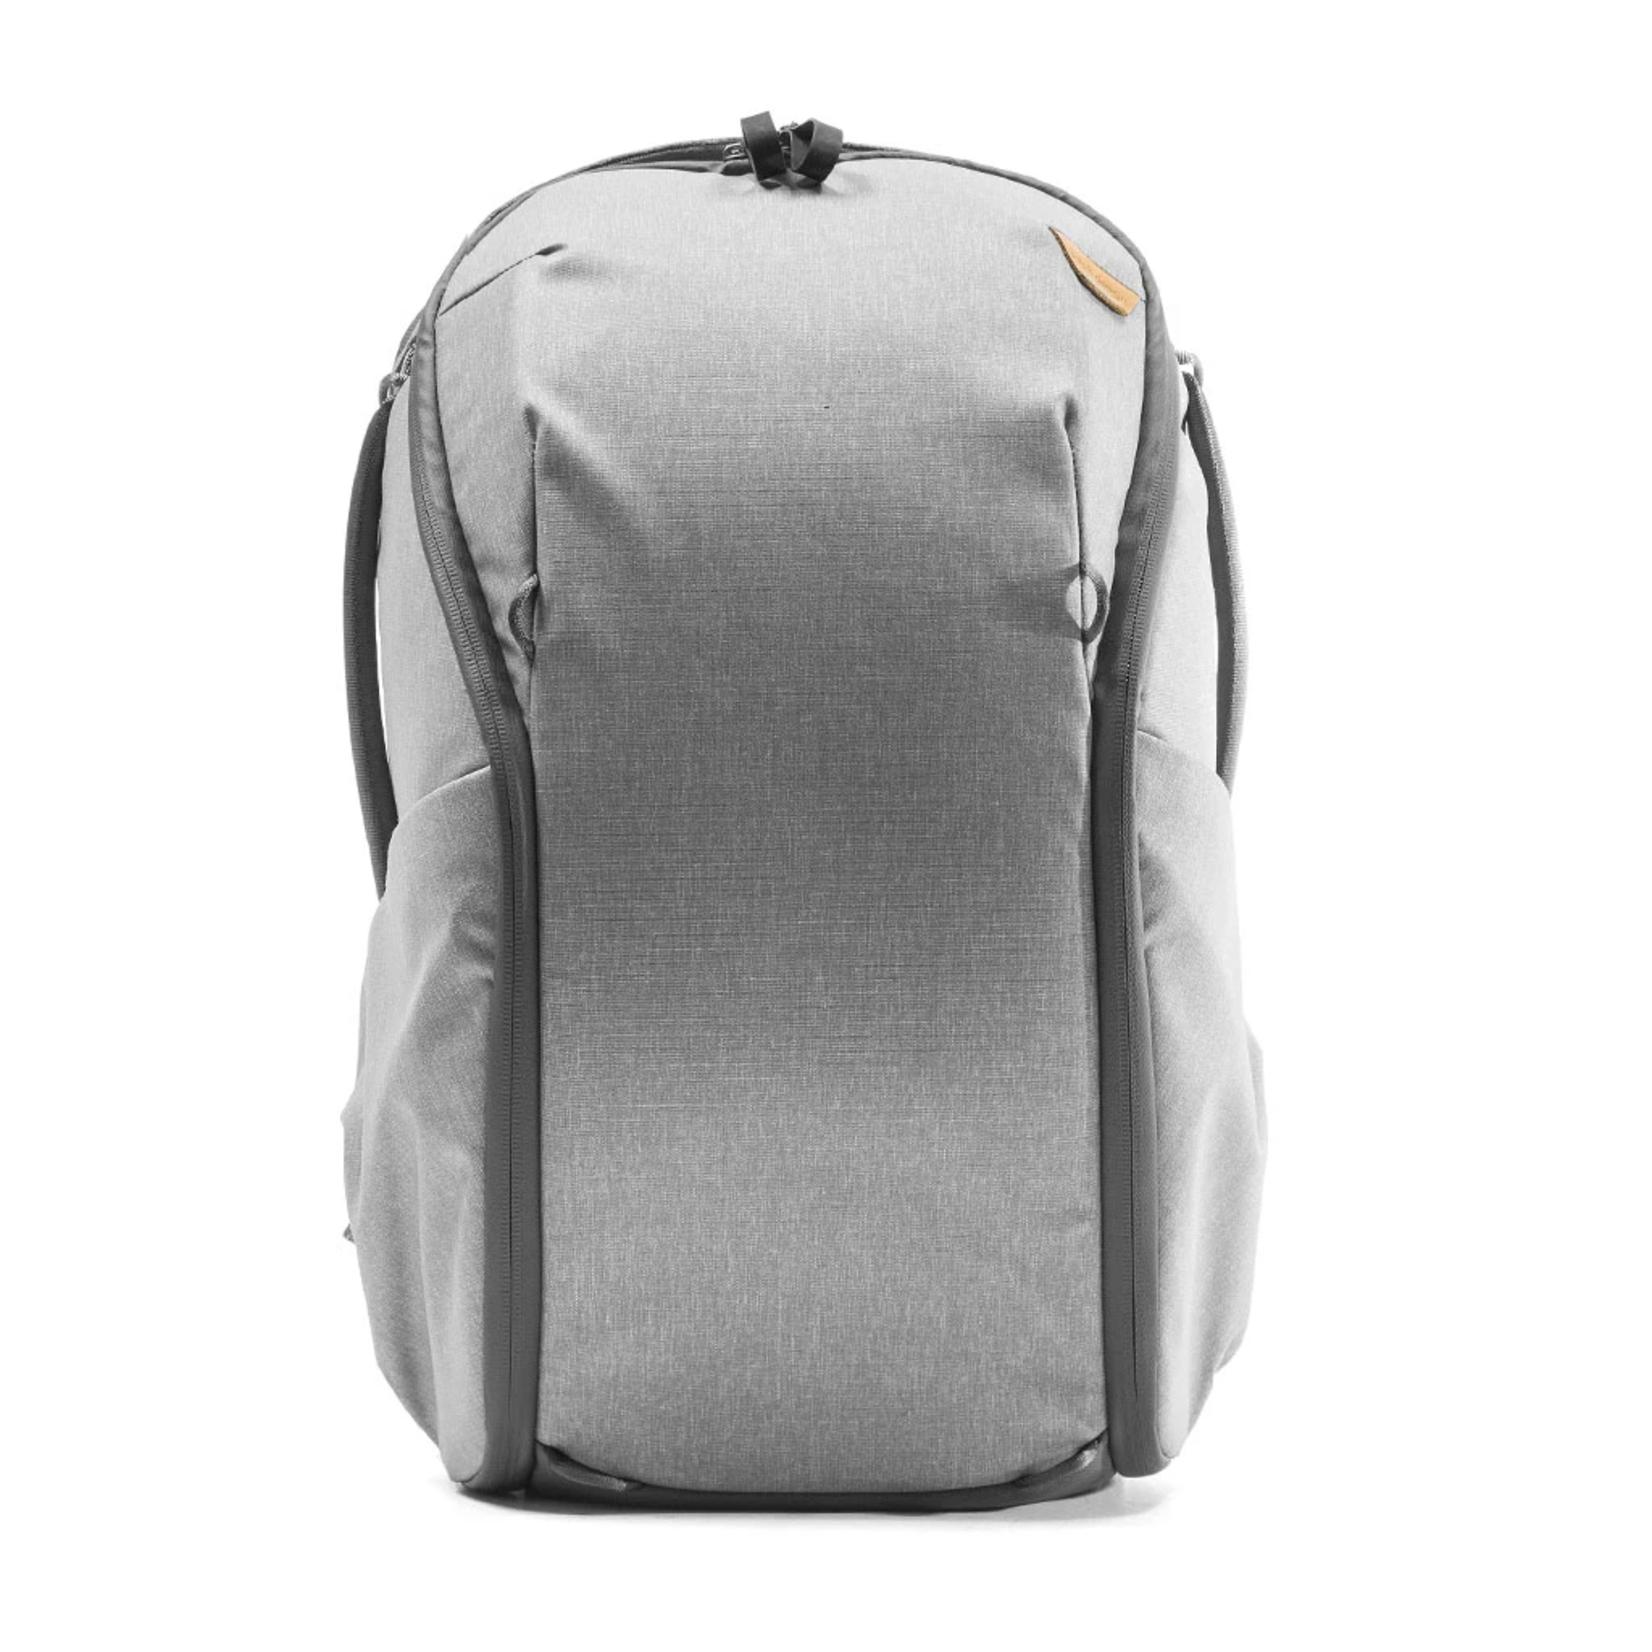 Peak Design Everyday Backpack 20L Zip - Ash